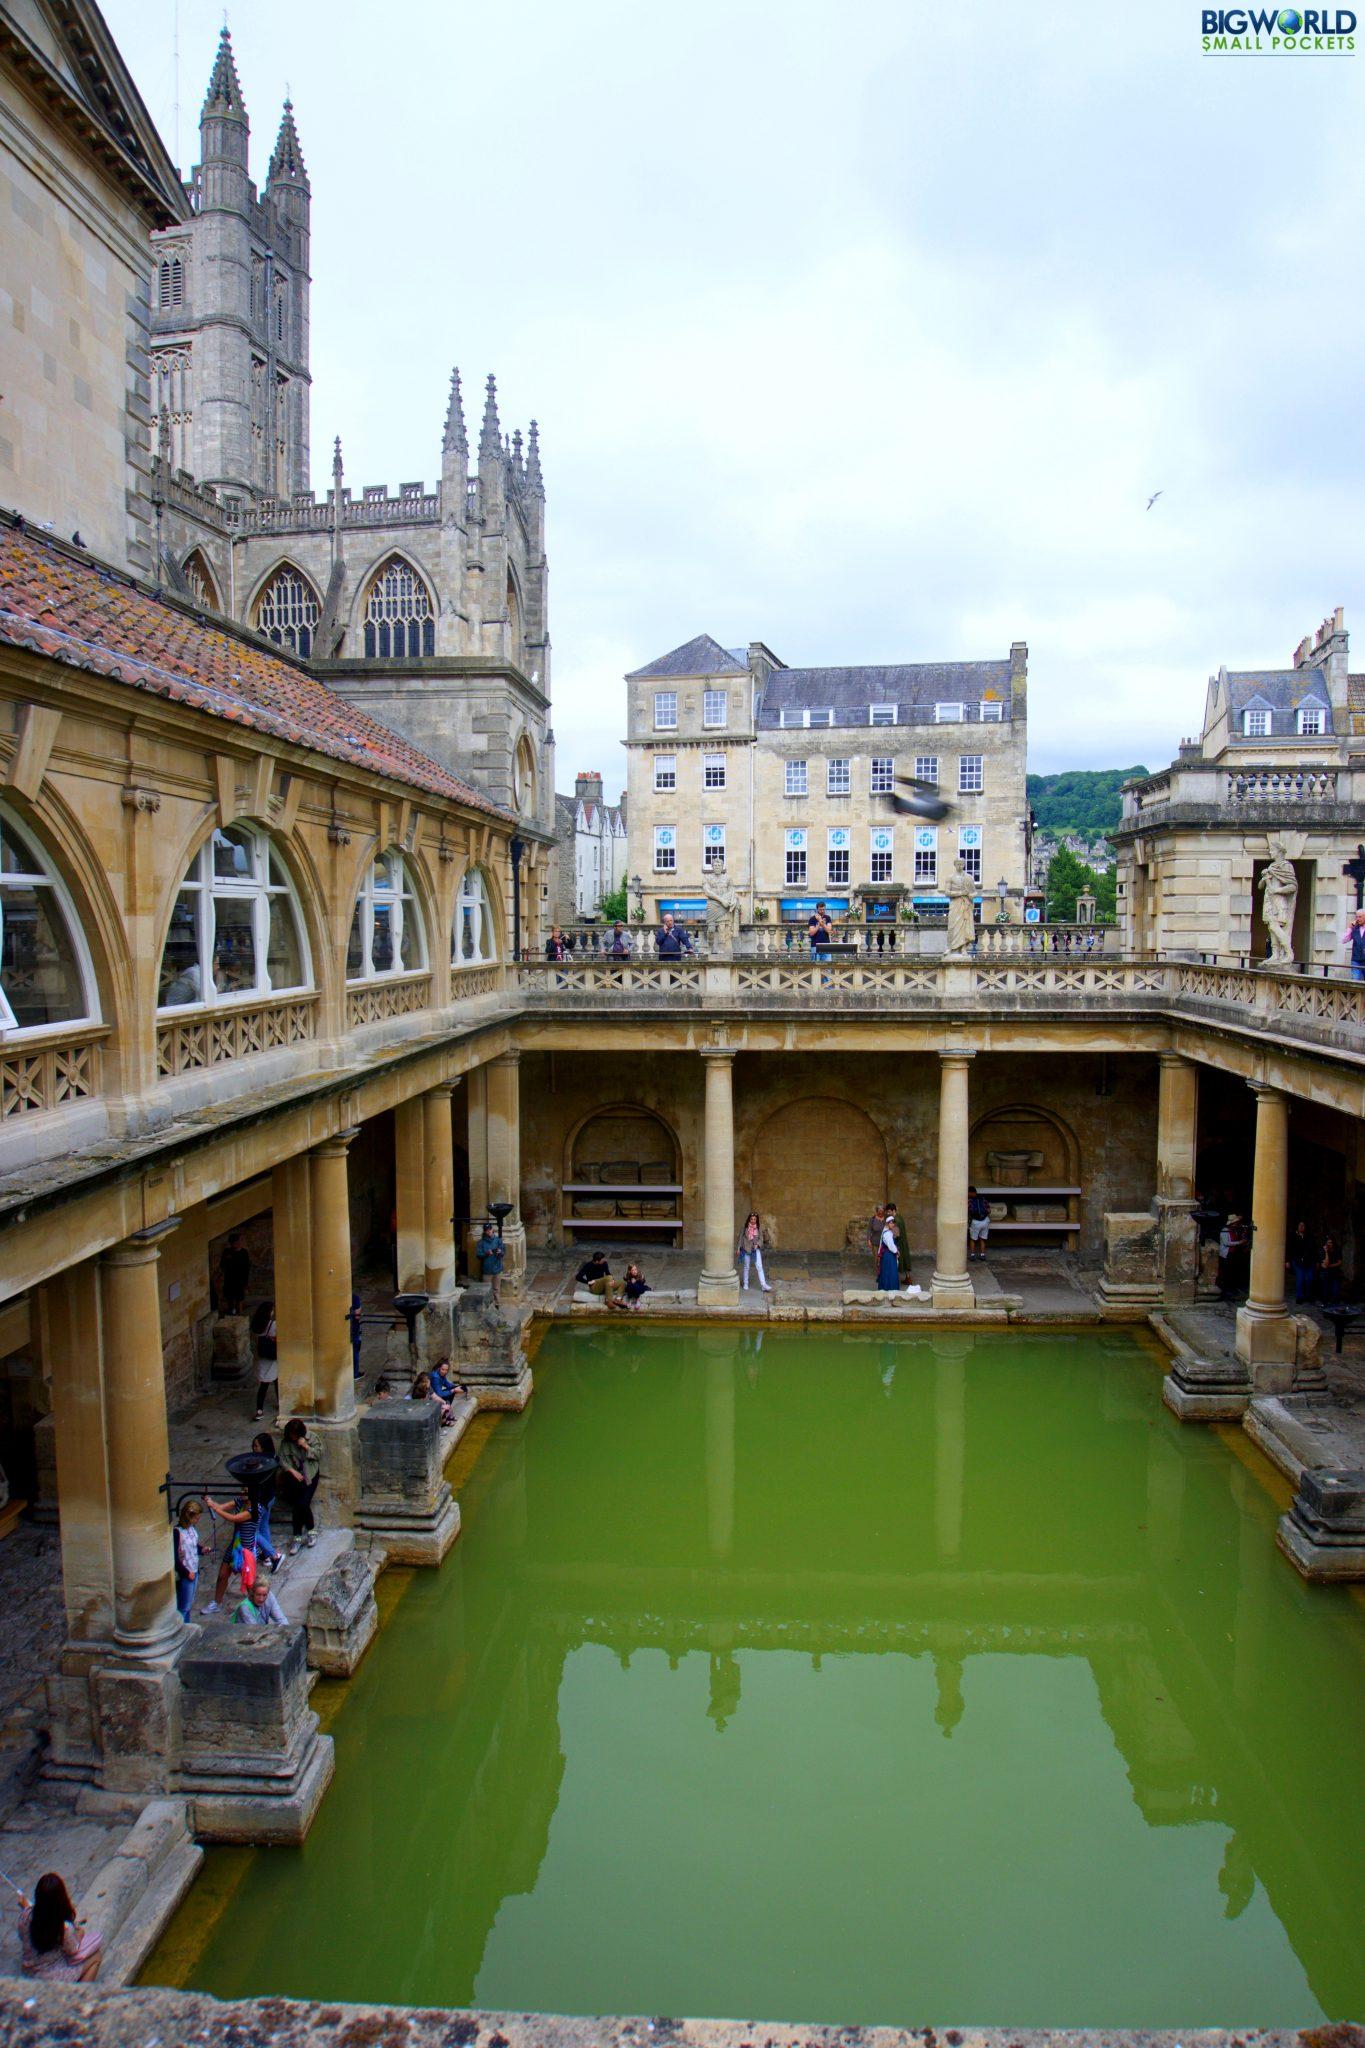 Cavendish Crescent, Bath - Wikipedia